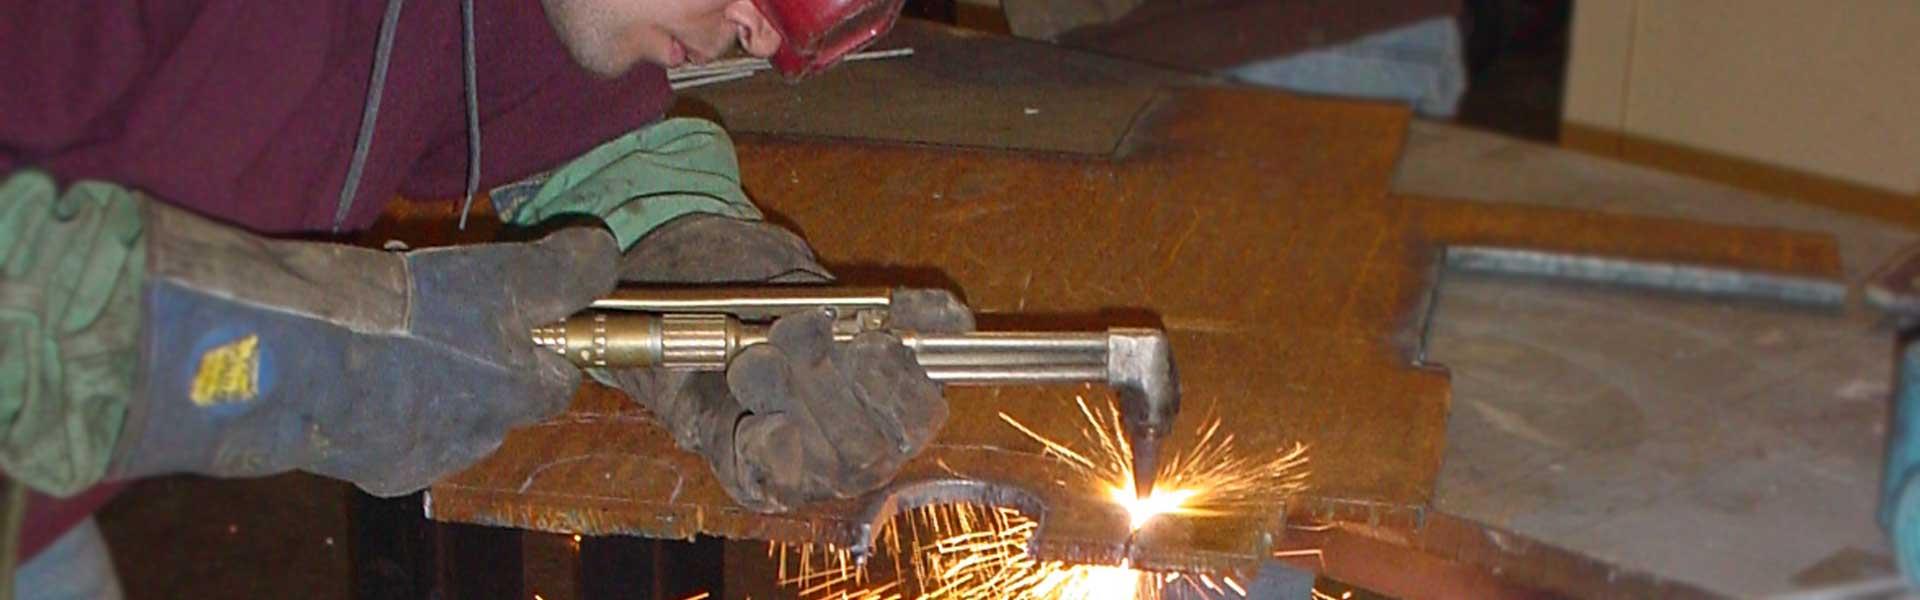 industrial millwright maintenance cedar rapids iowa city dubuque iowa